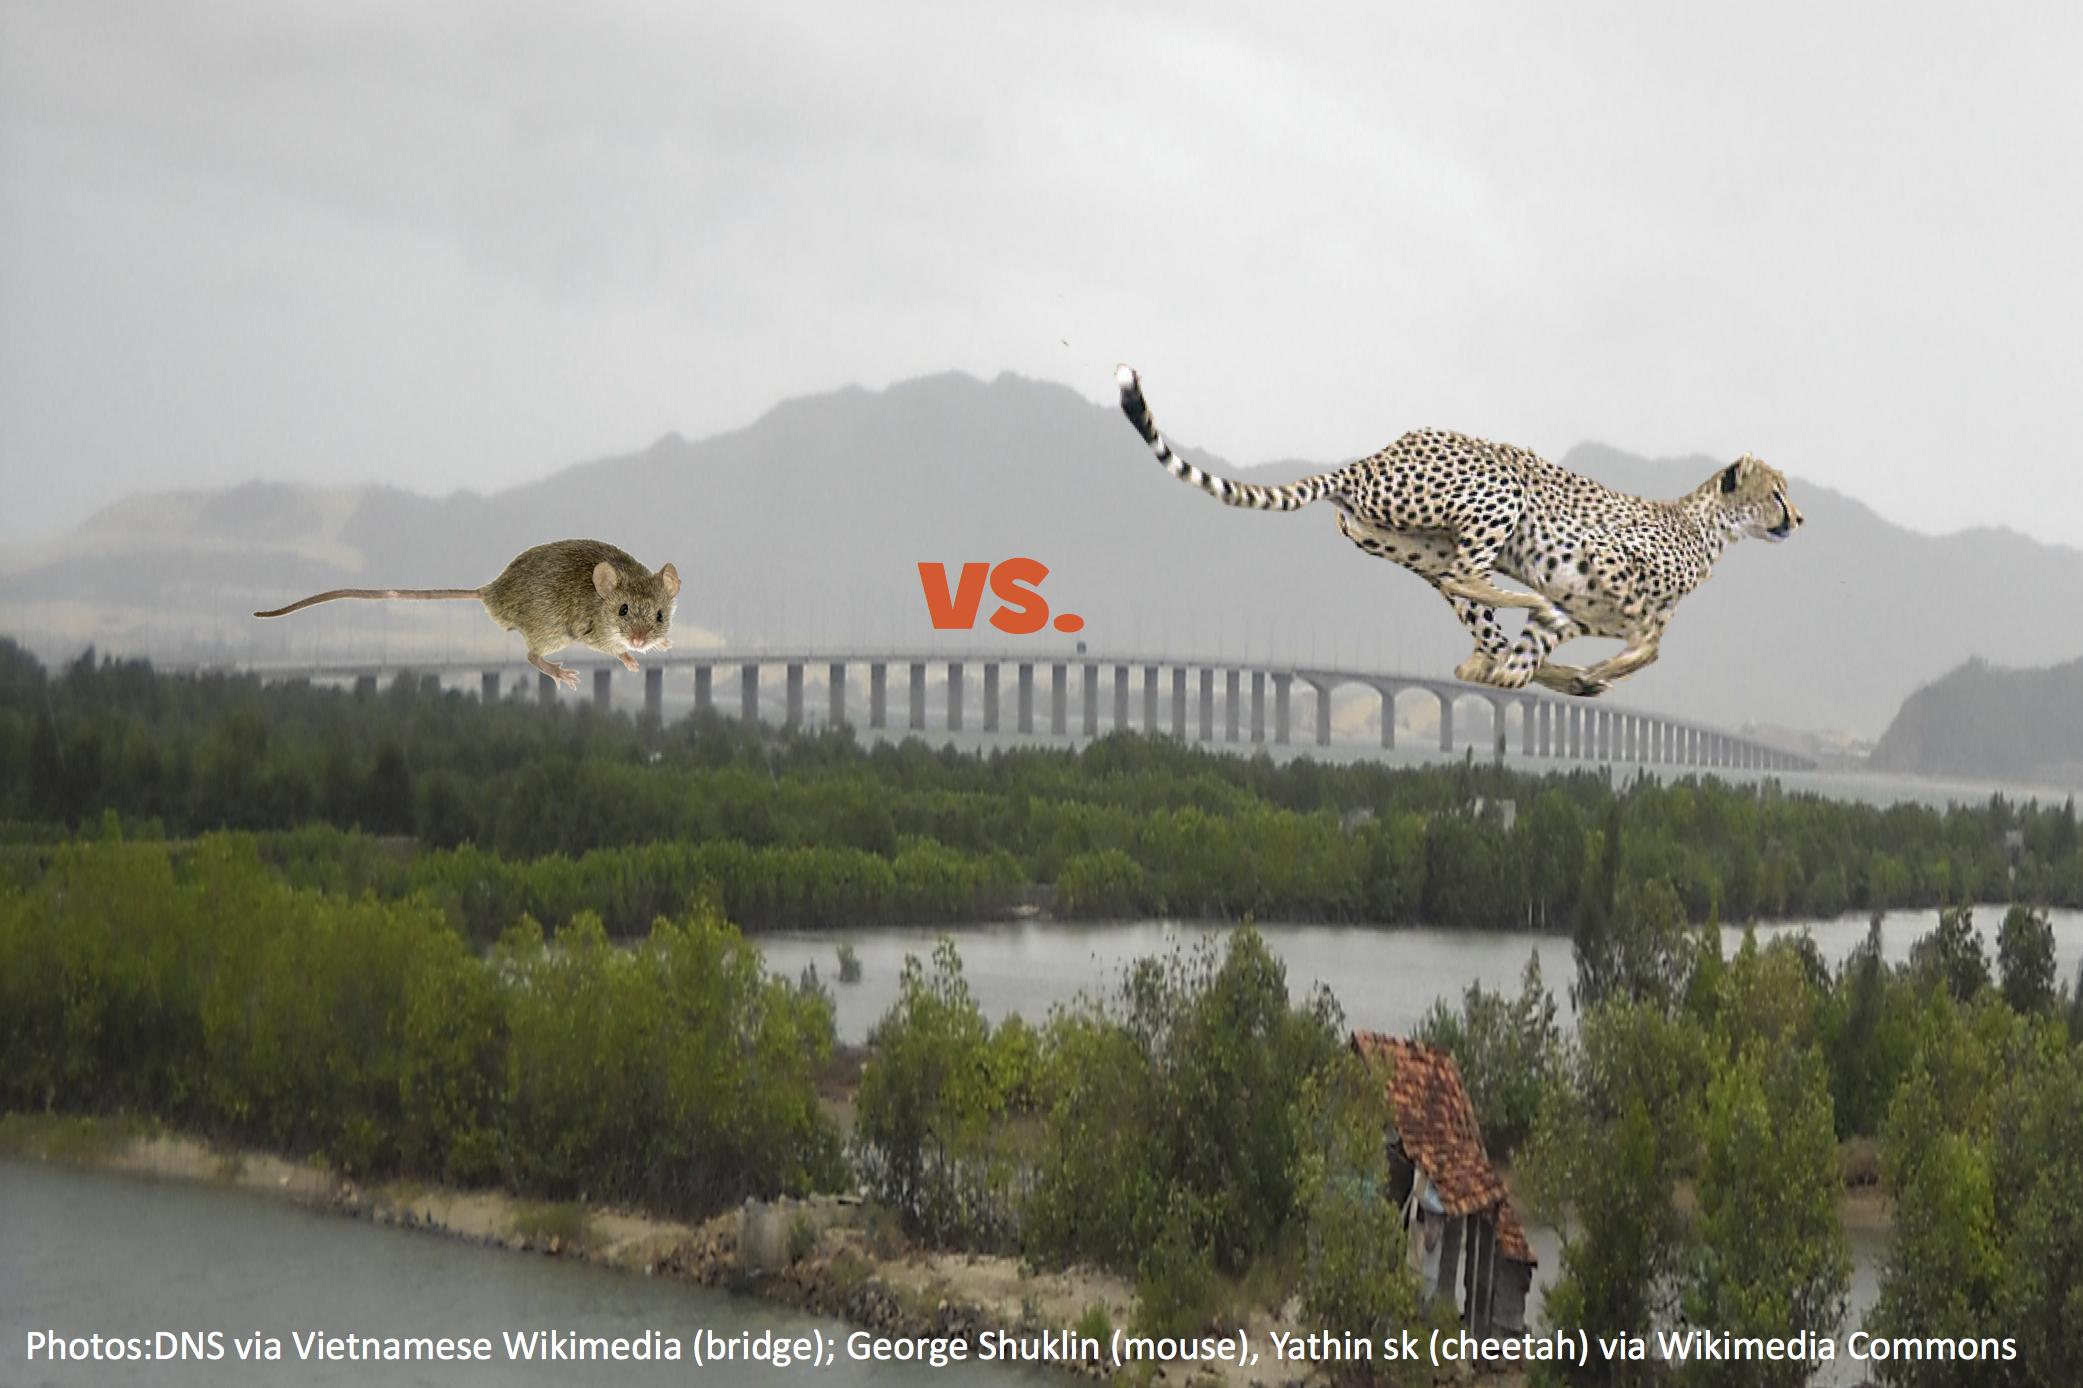 Why Did the Cheetah Cross the Bridge?